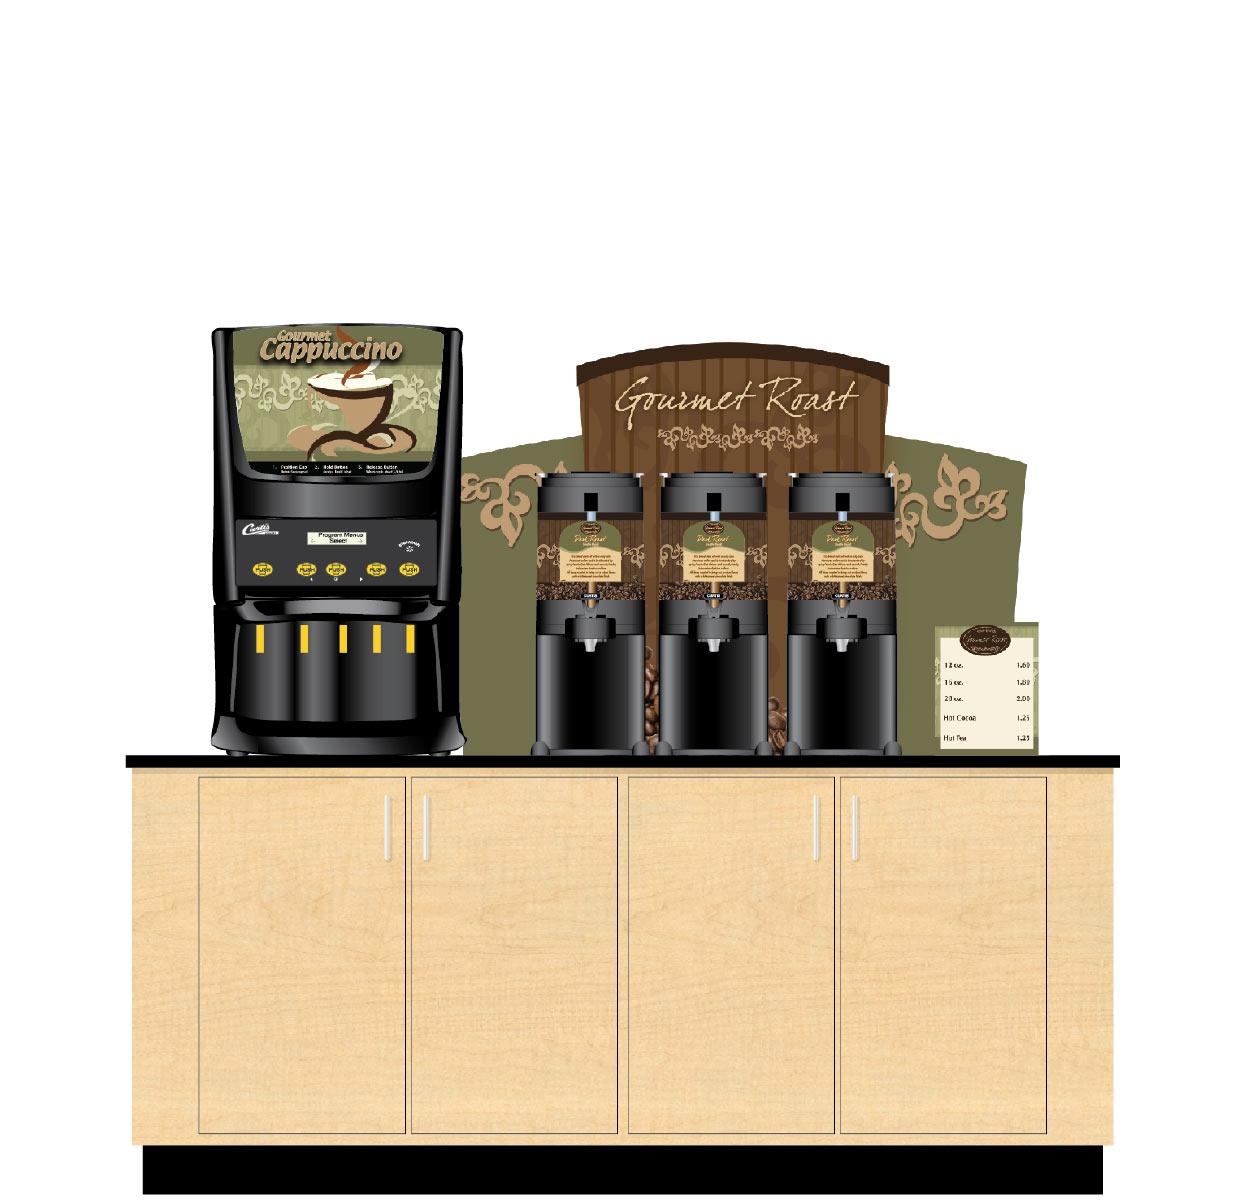 GourmetRoast-Kiosk-Small.jpg